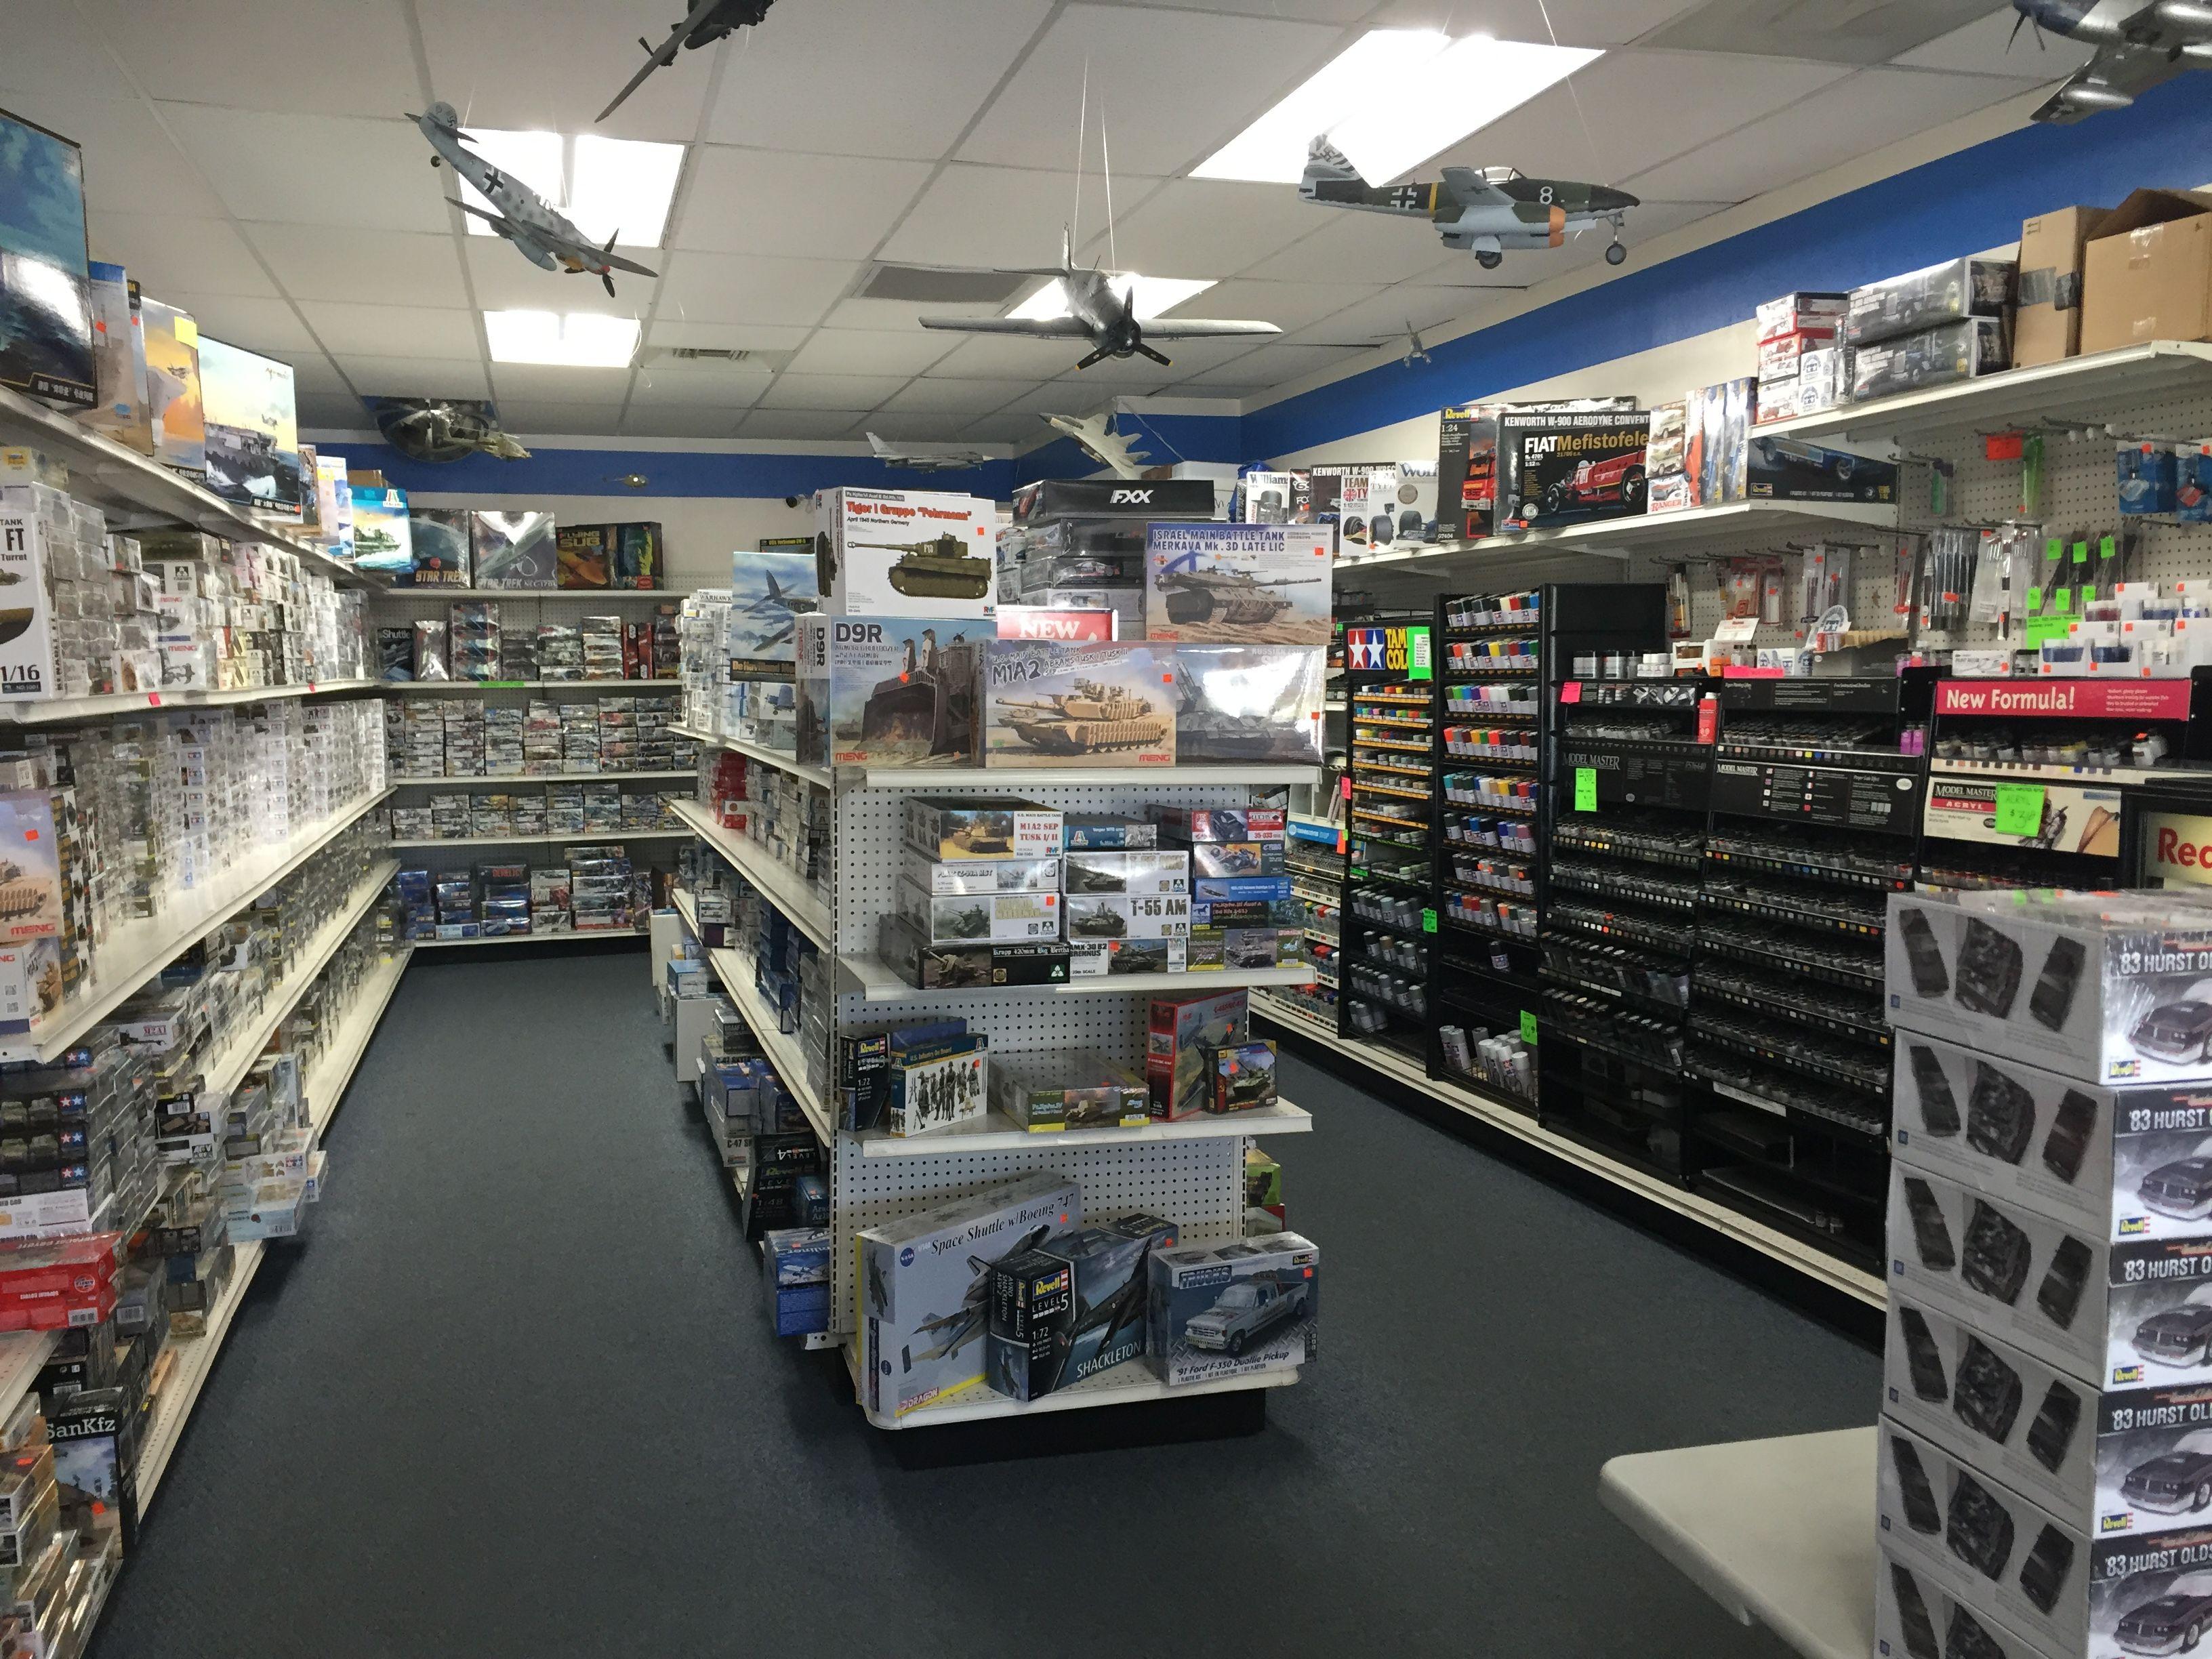 Andy S Hobby Headquarters 15224 N 59th Ave Glendale Az 85306 Andyshobbyheadquarters Com